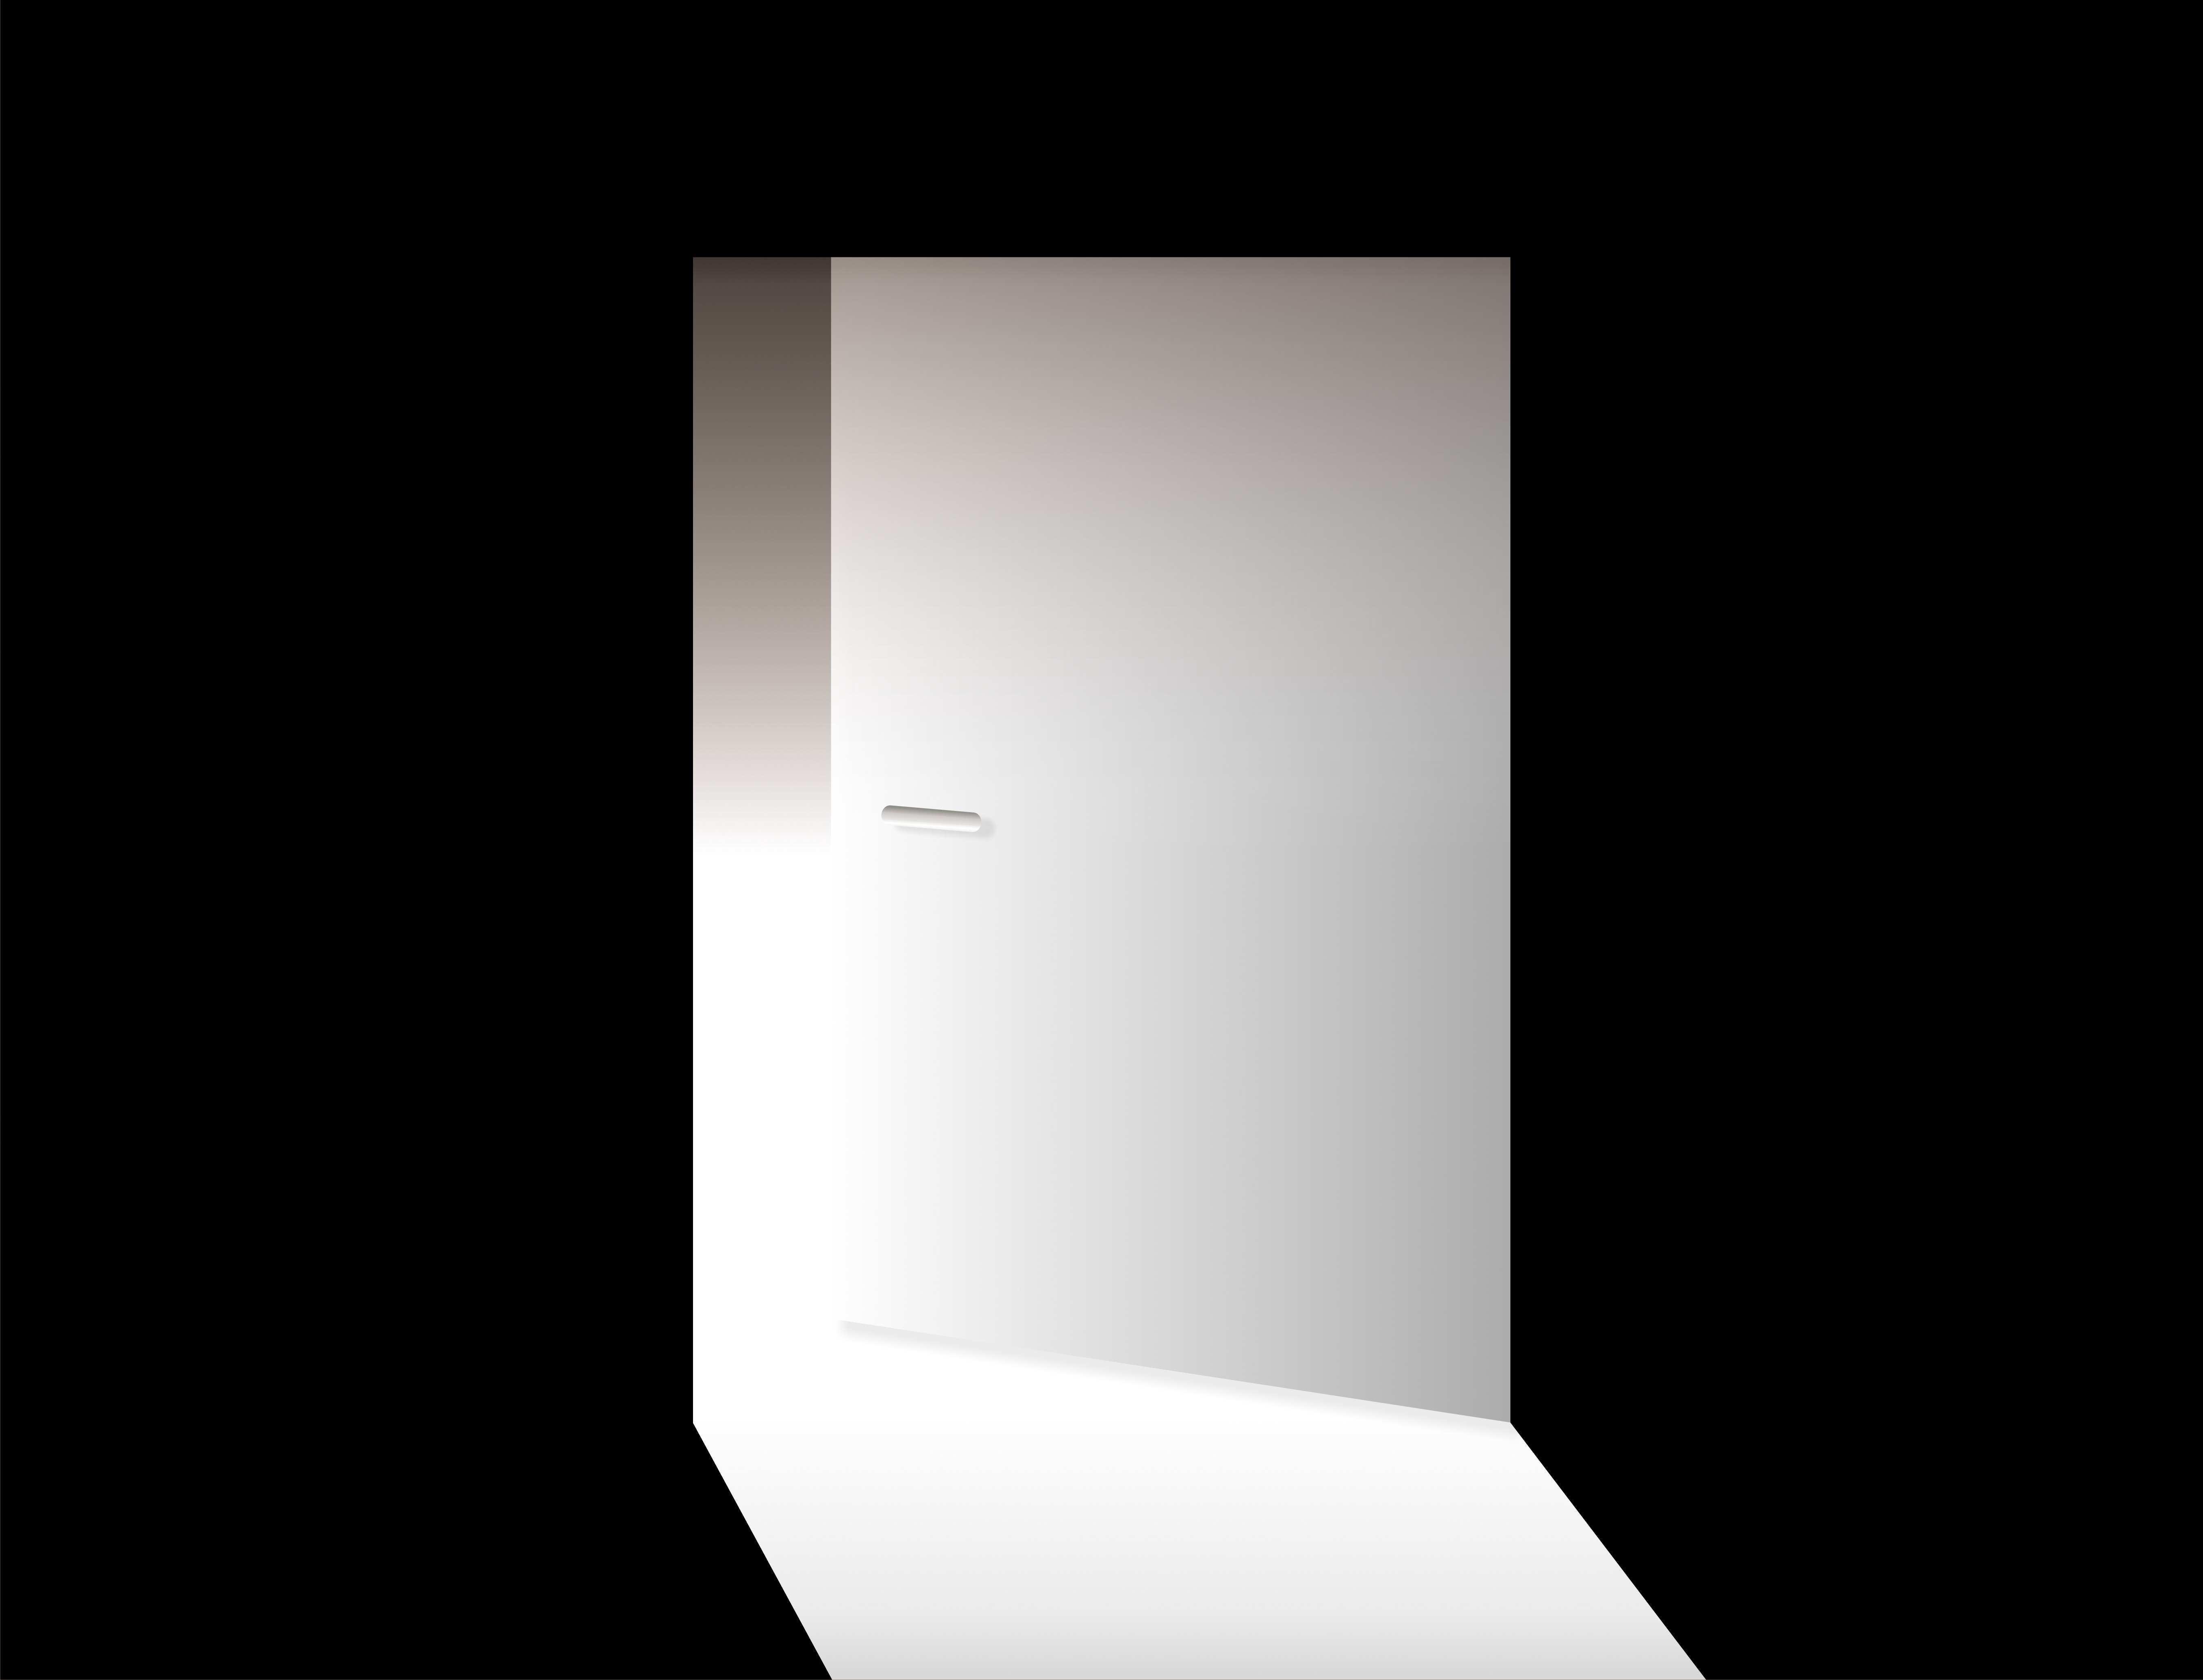 Abwesenheitsnotiz In Outlook Erstellen Office Lernen Com